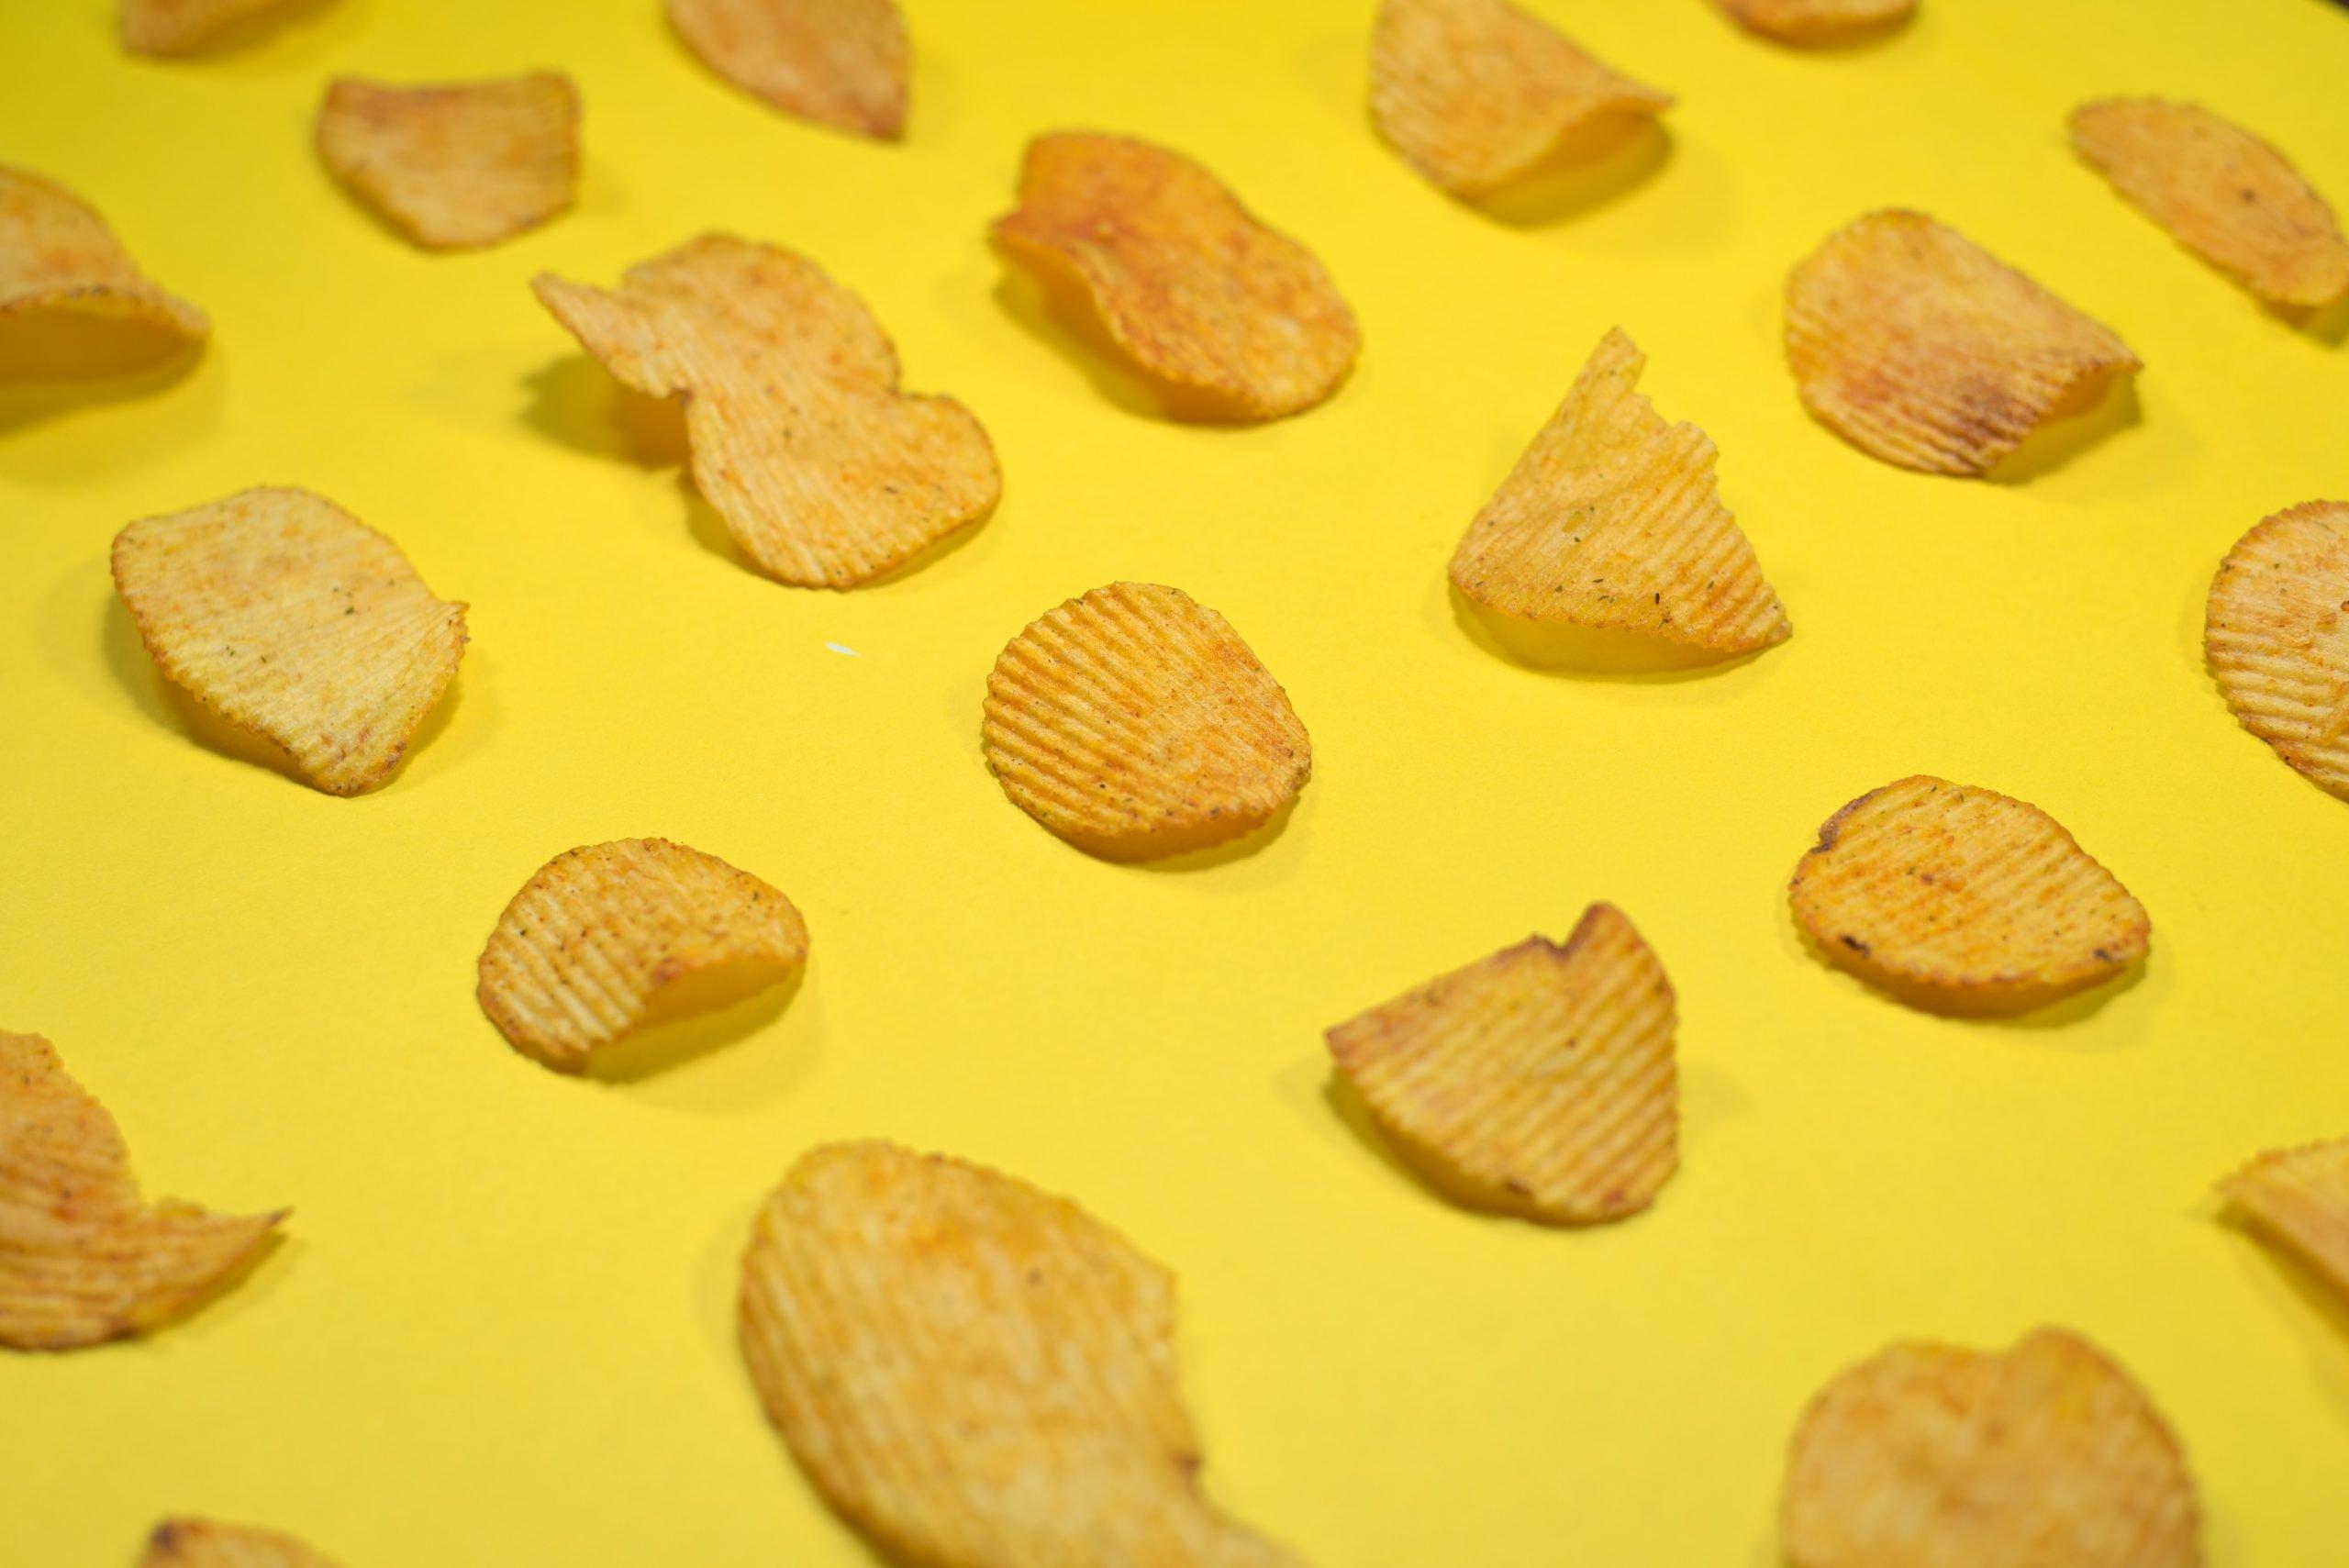 Potato chips on a yellow underground